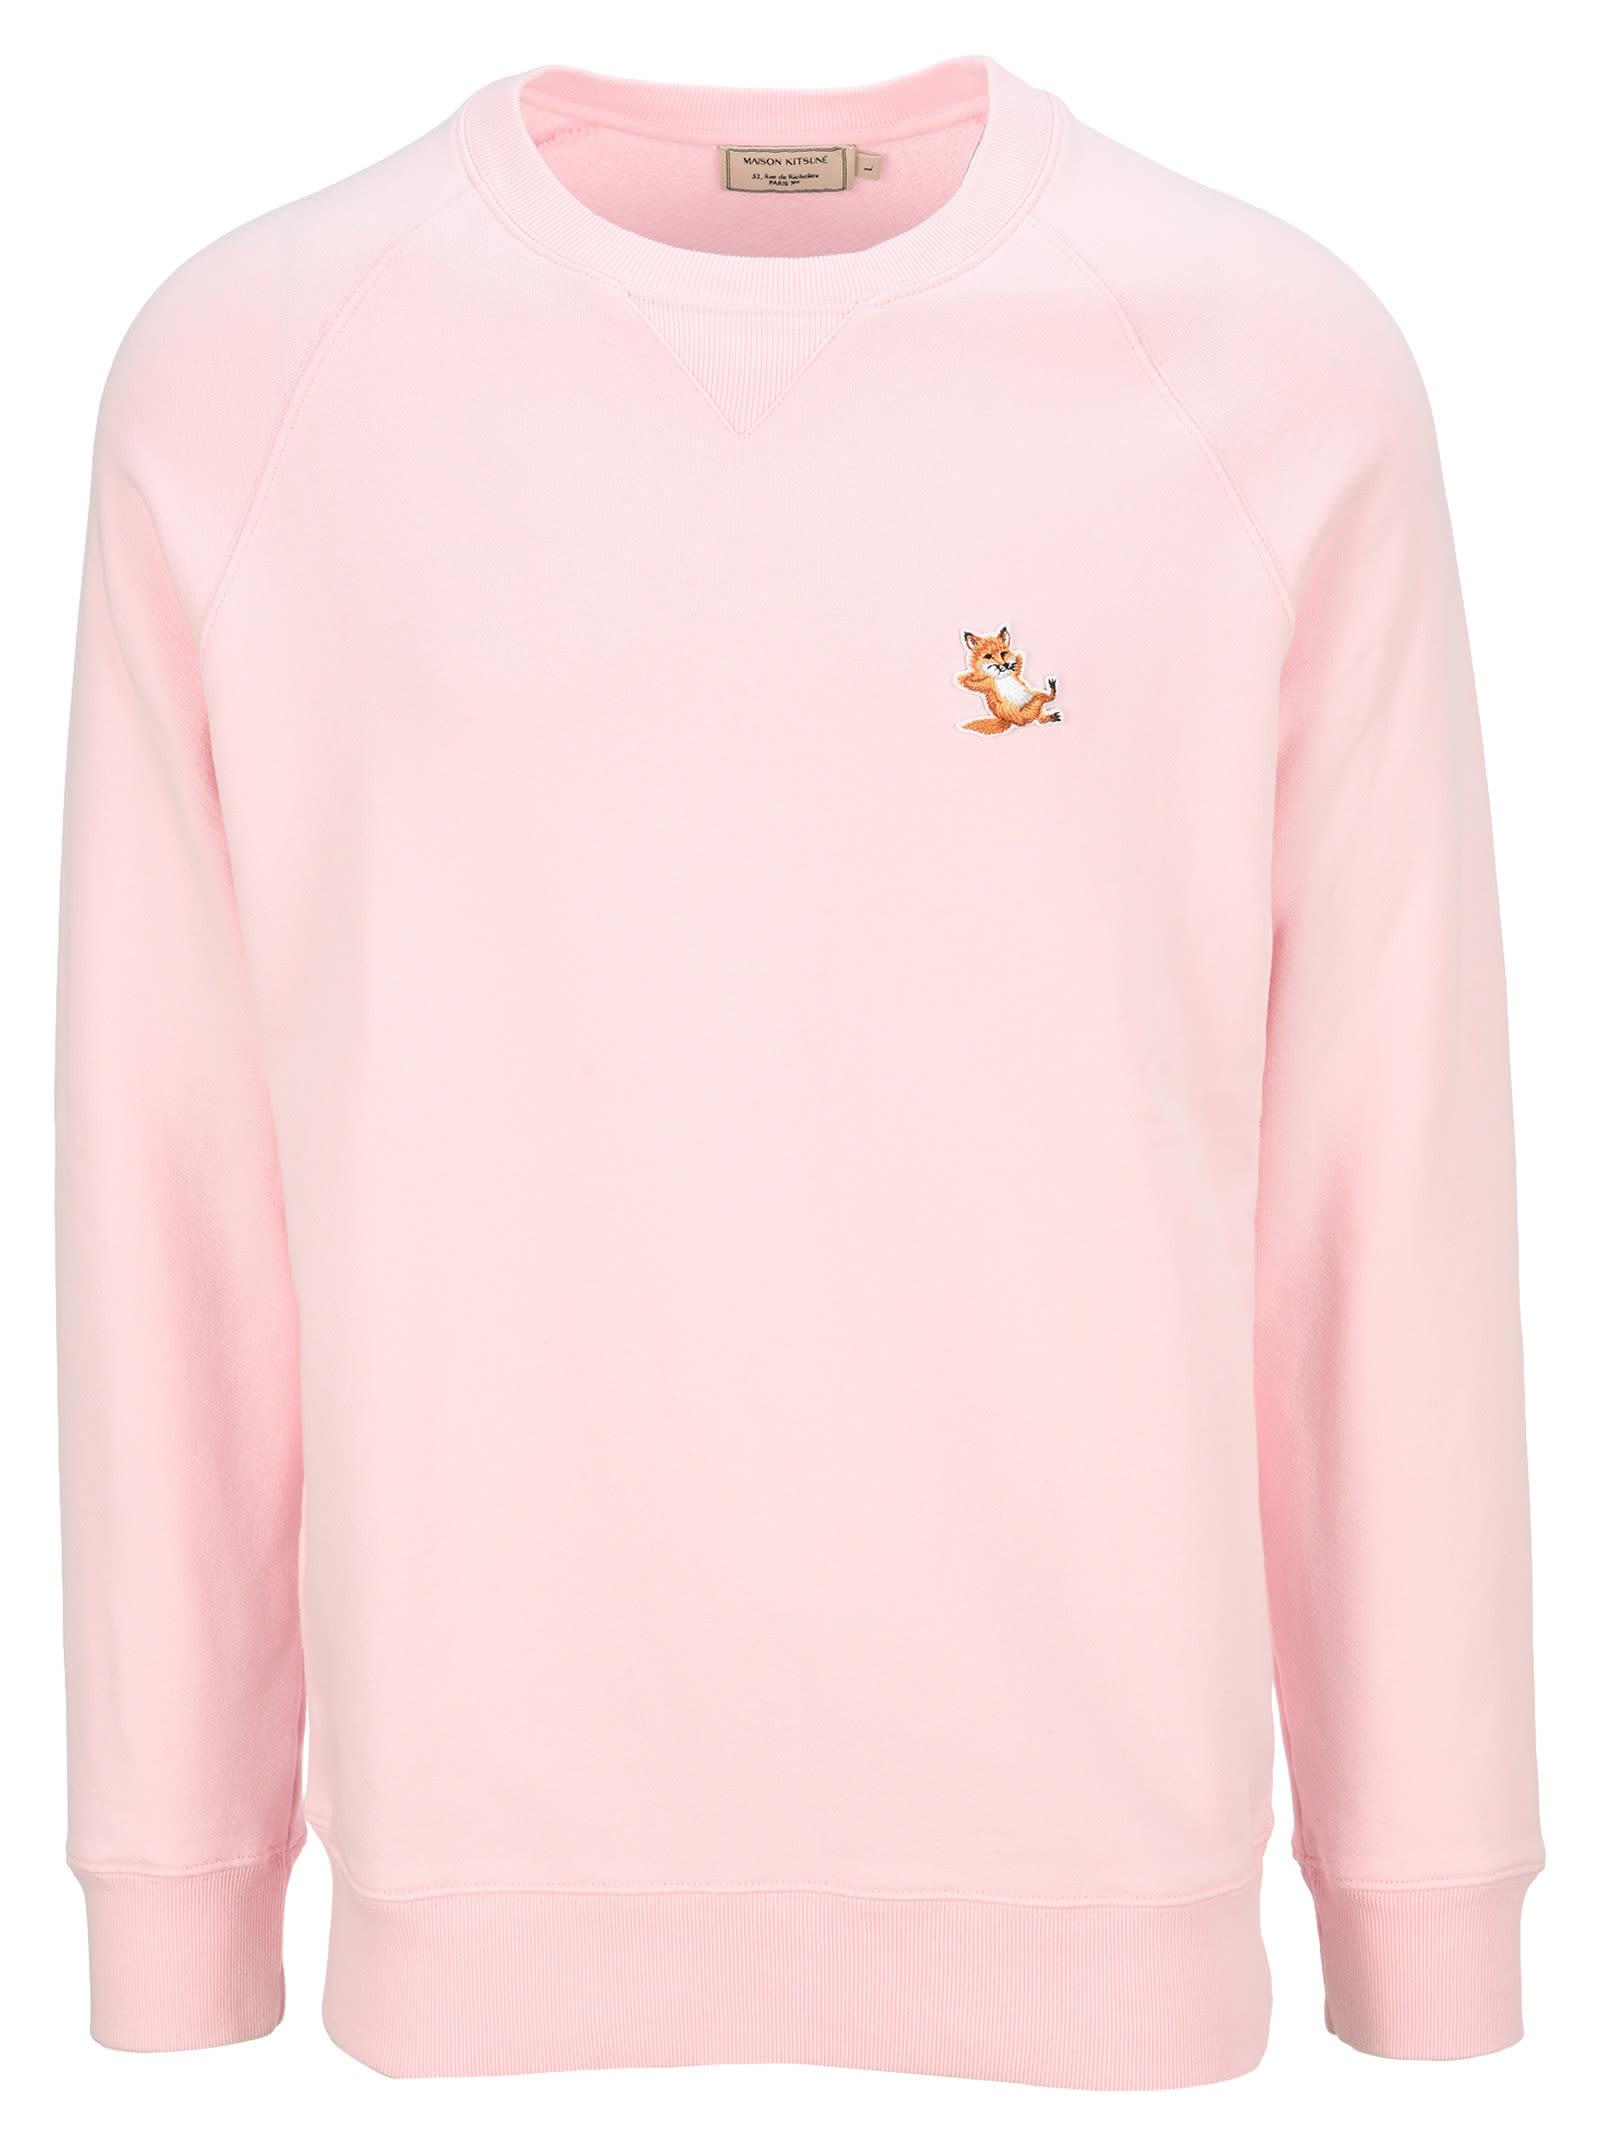 Maison Kitsuné Sweatshirts MAISON KITSUNE CHILLAX FOX CREW